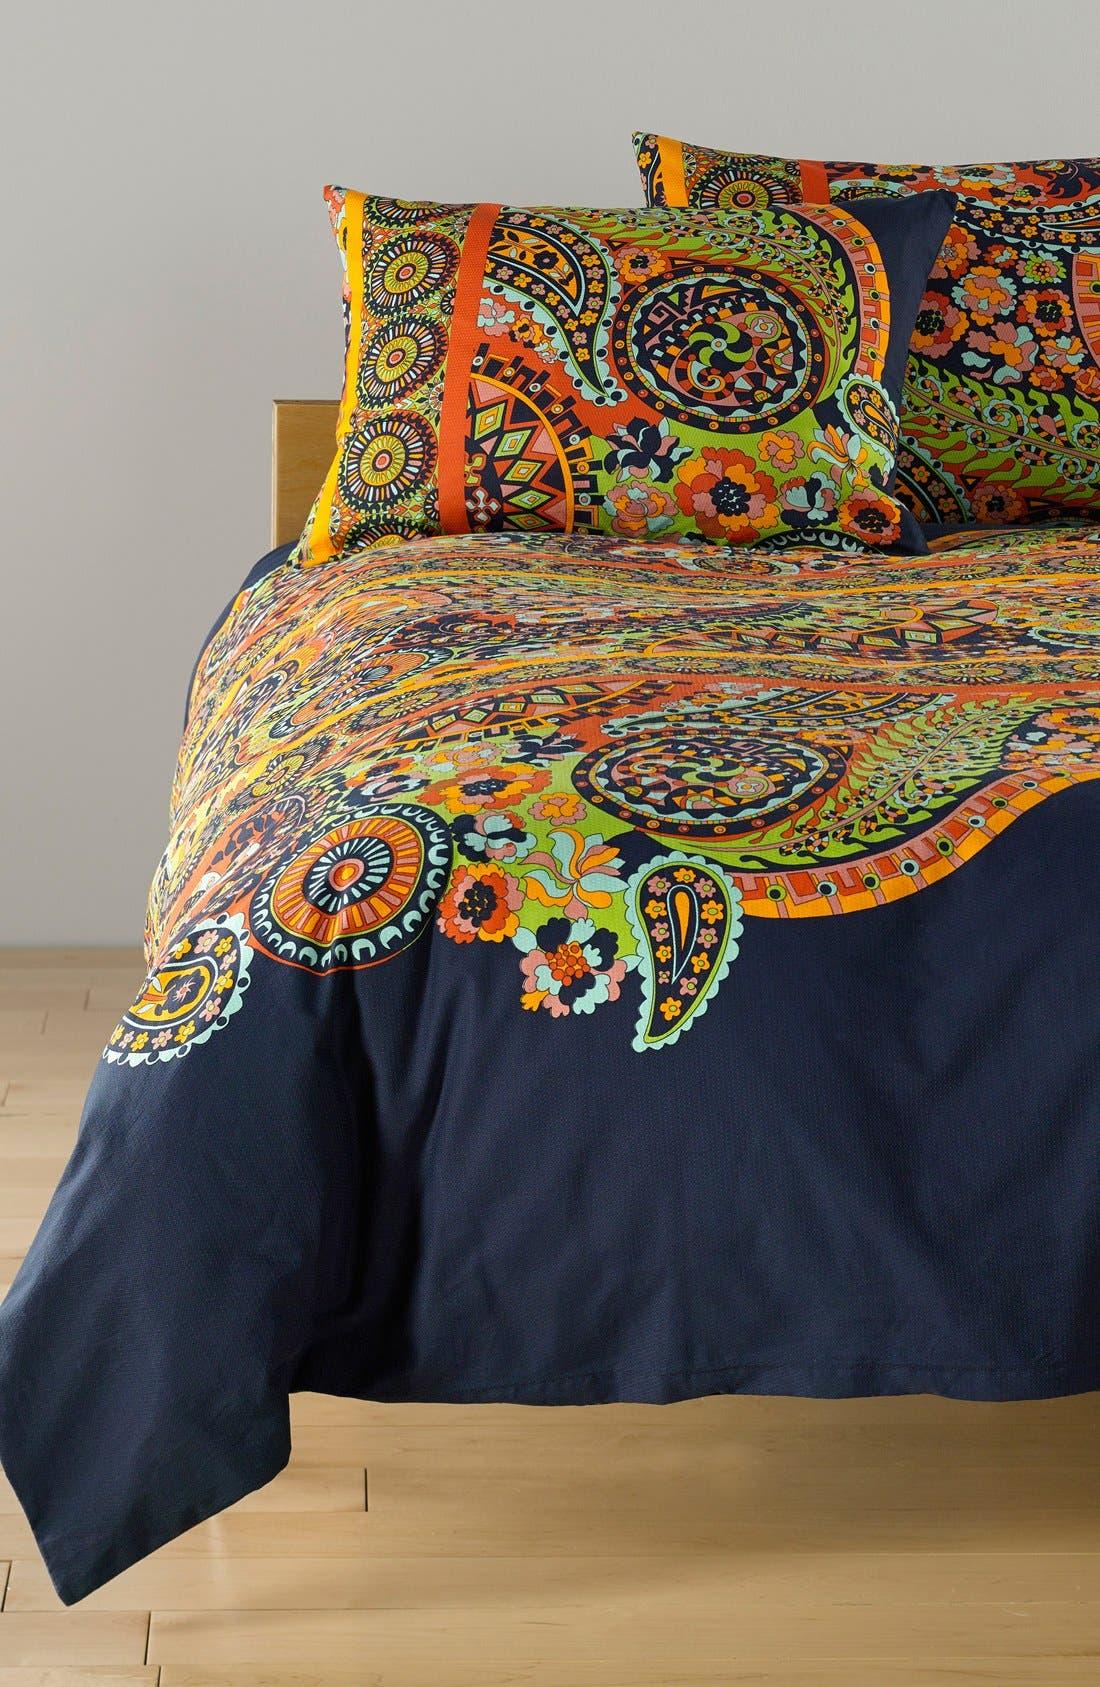 Alternate Image 1 Selected - Josie by Natori 'Boho' Duvet Cover Set